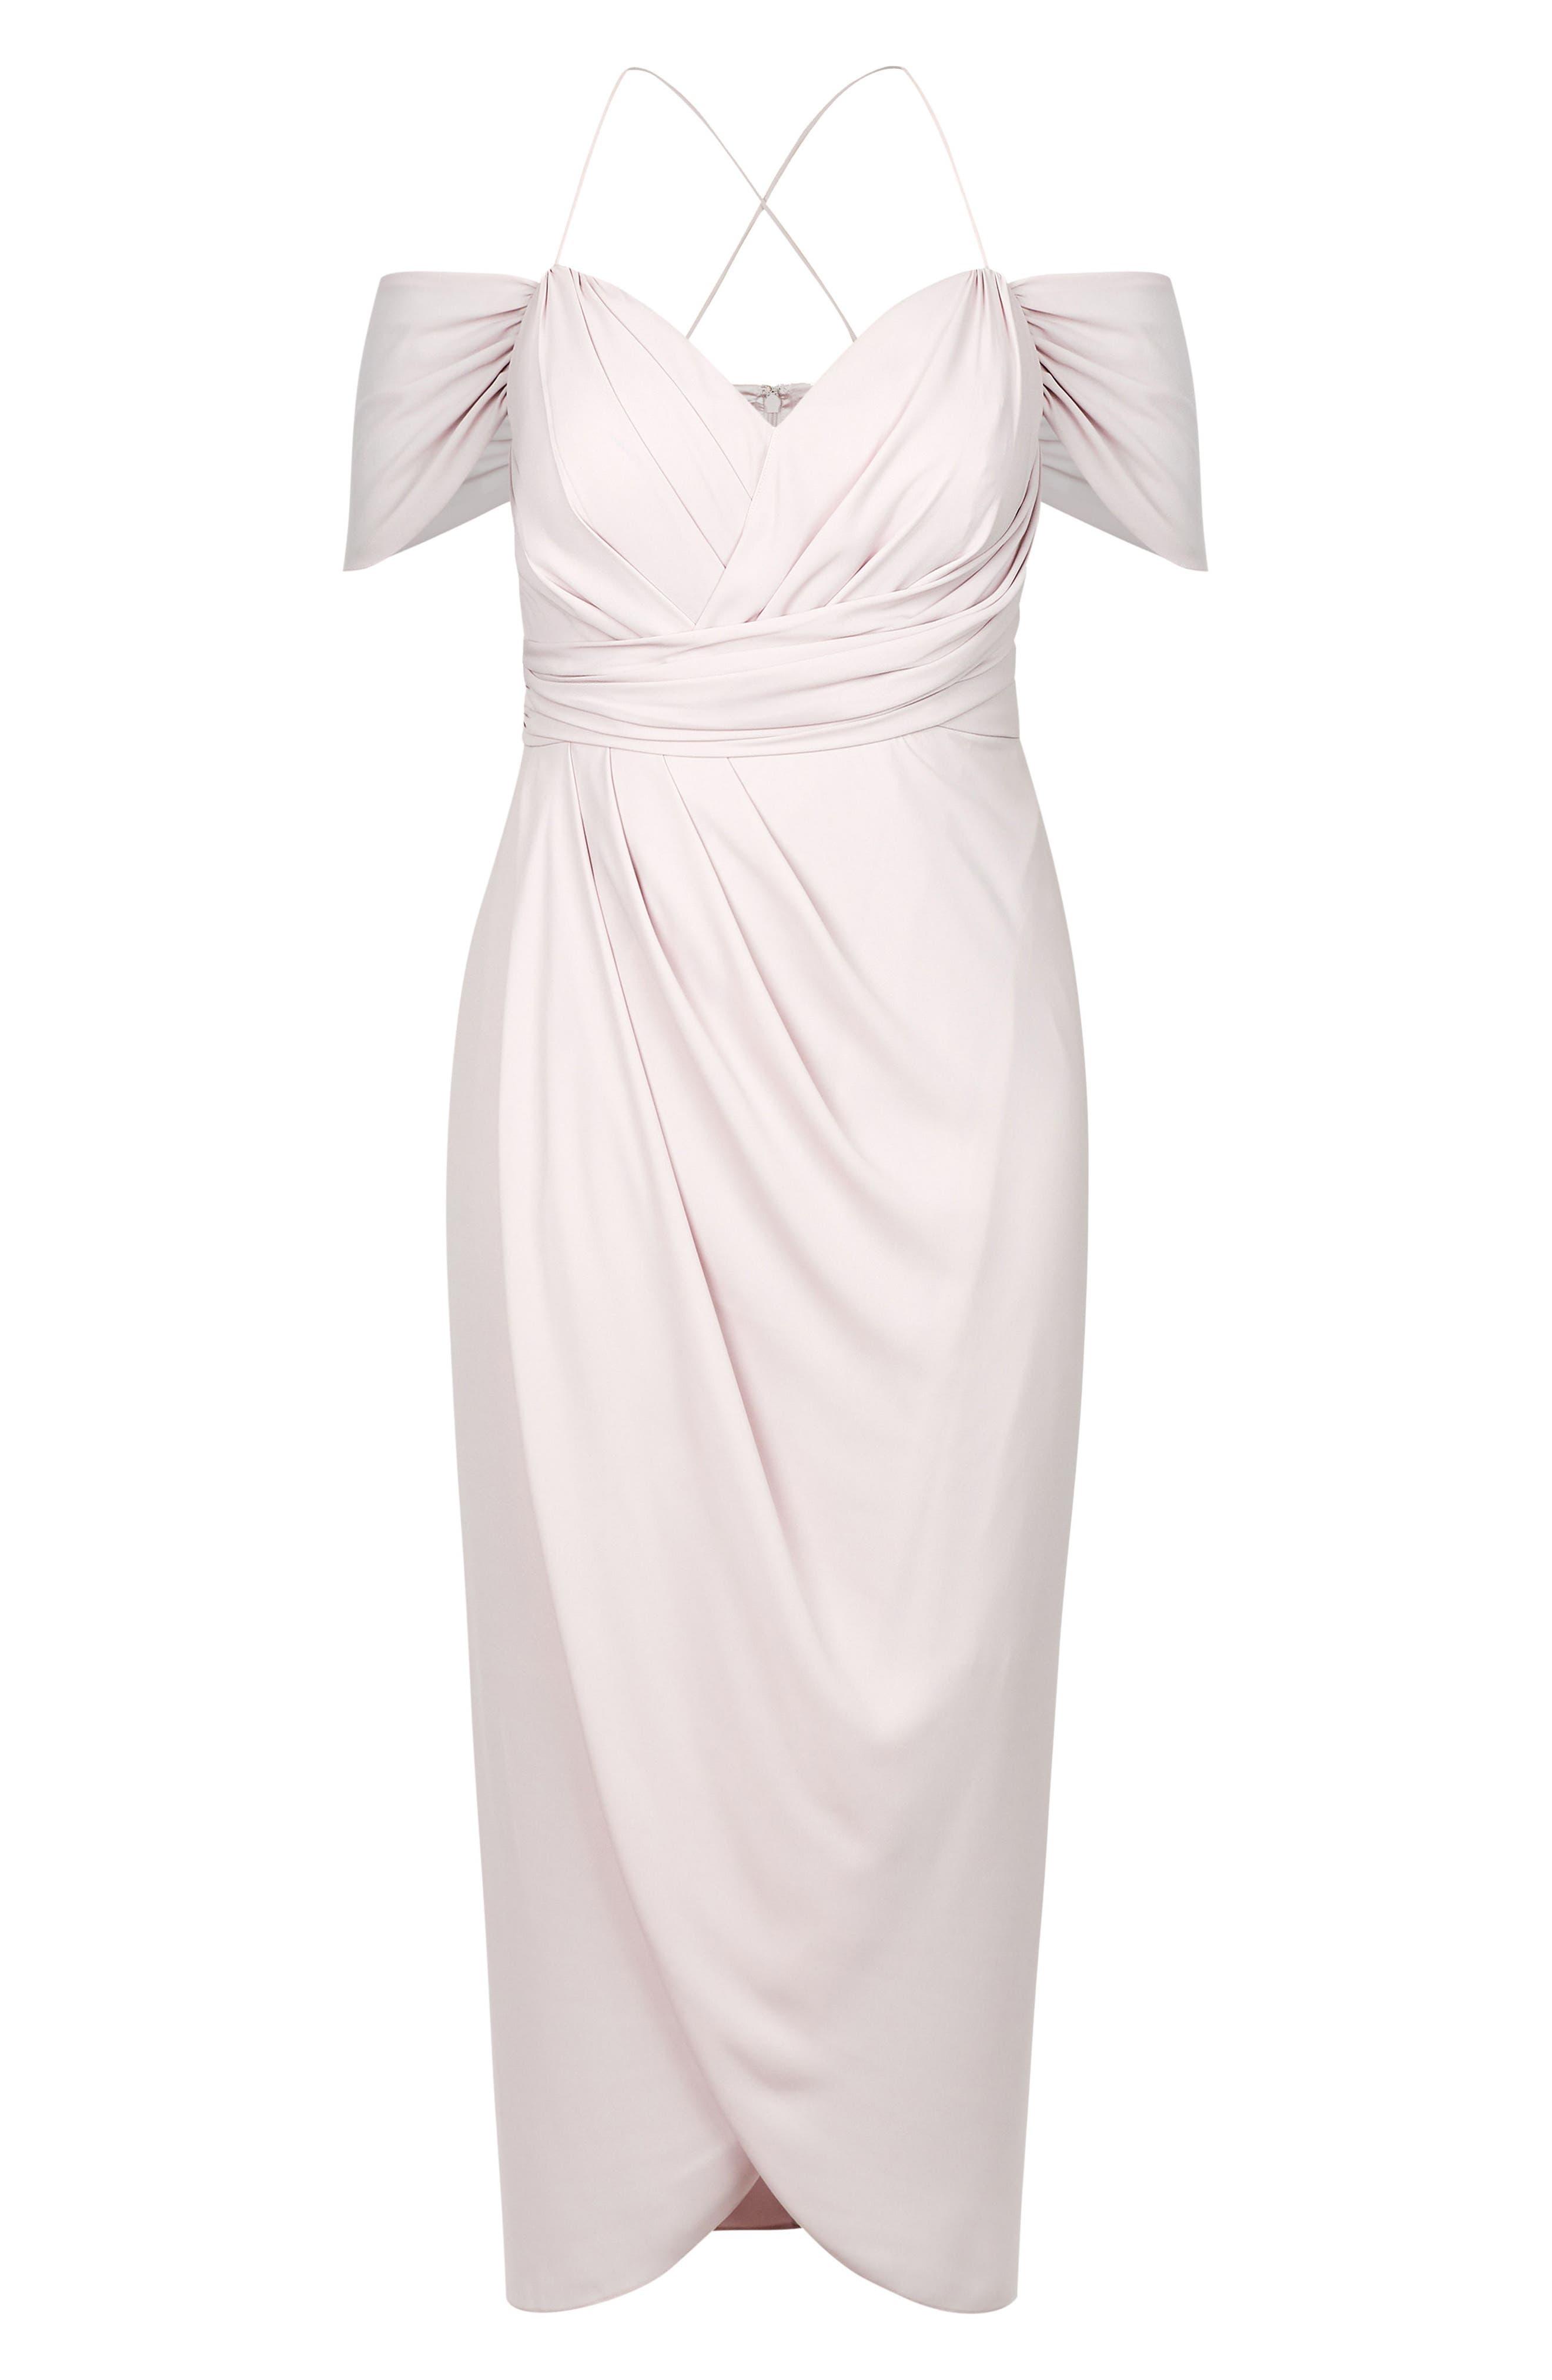 CITY CHIC, Entwine Cold Shoulder Maxi Dress, Alternate thumbnail 3, color, SOFT BLUSH